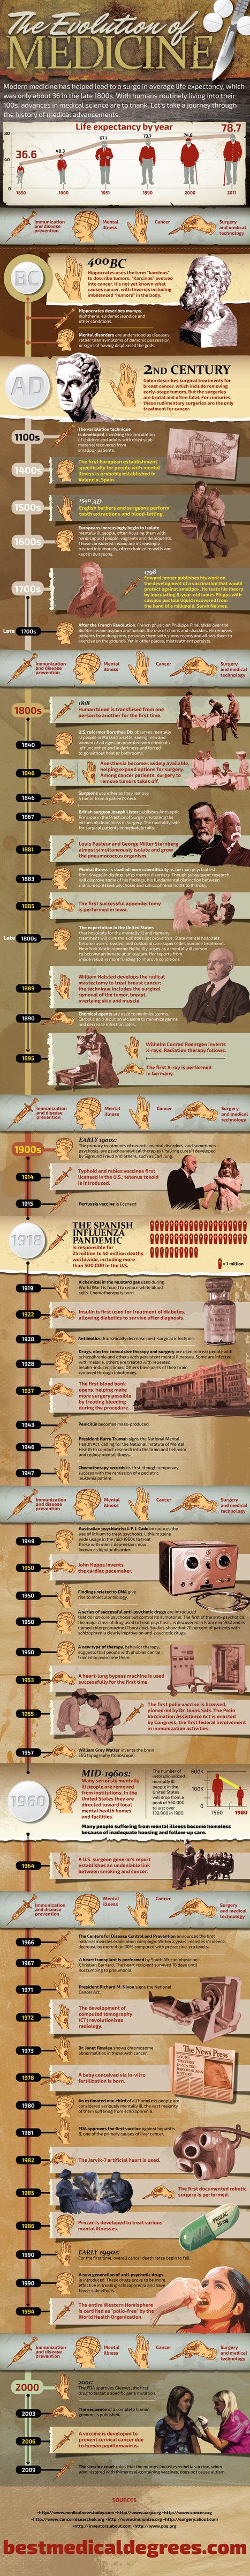 #Infographic: The Evolution of Medicine | Pharma Digital News | Scoop.it